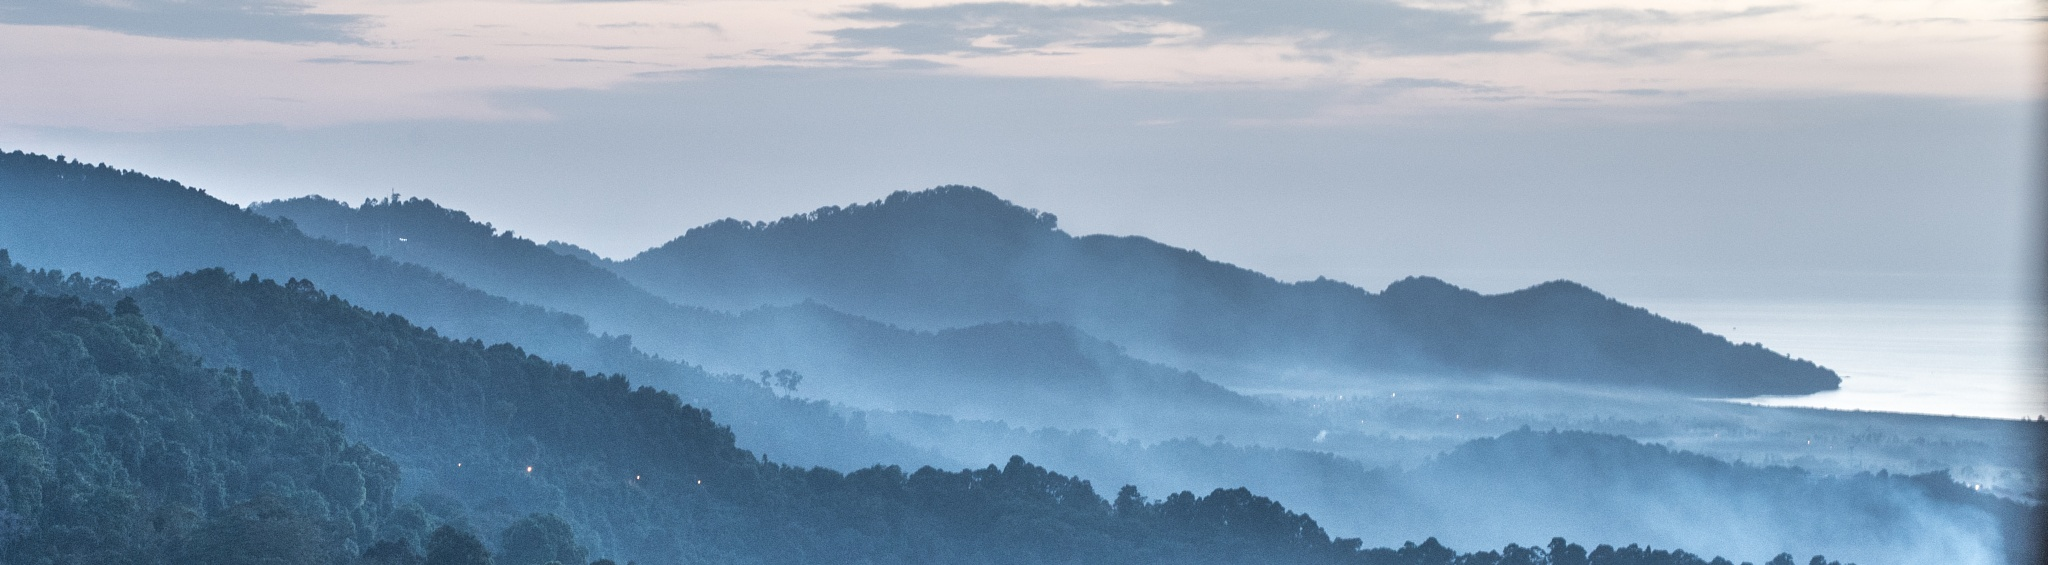 Mountain by Aluda Tan